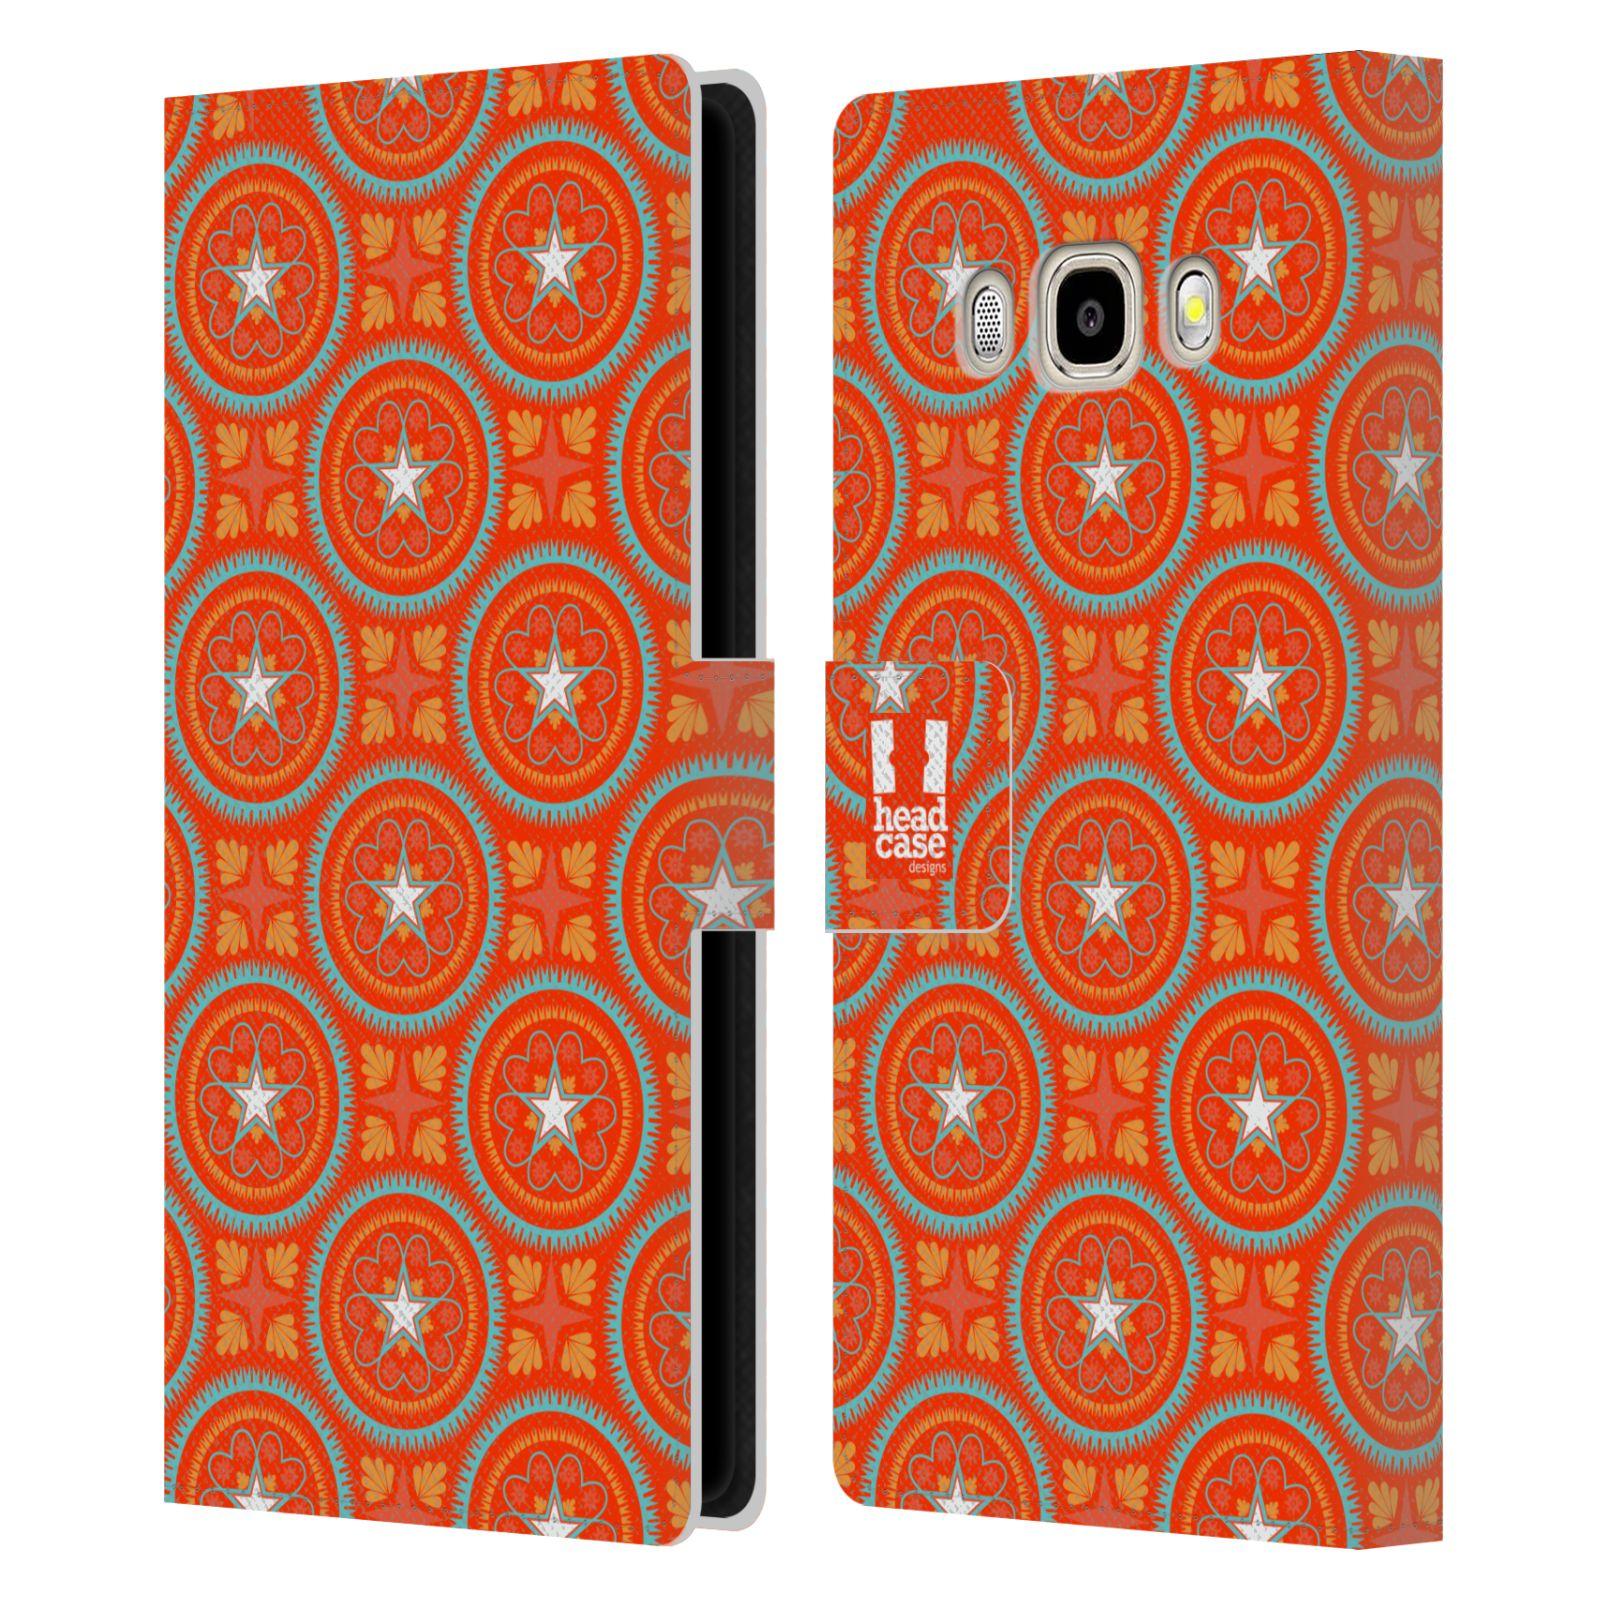 HEAD CASE Flipové pouzdro pro mobil Samsung Galaxy J5 2016 Slovanský vzor oranžová hvězda